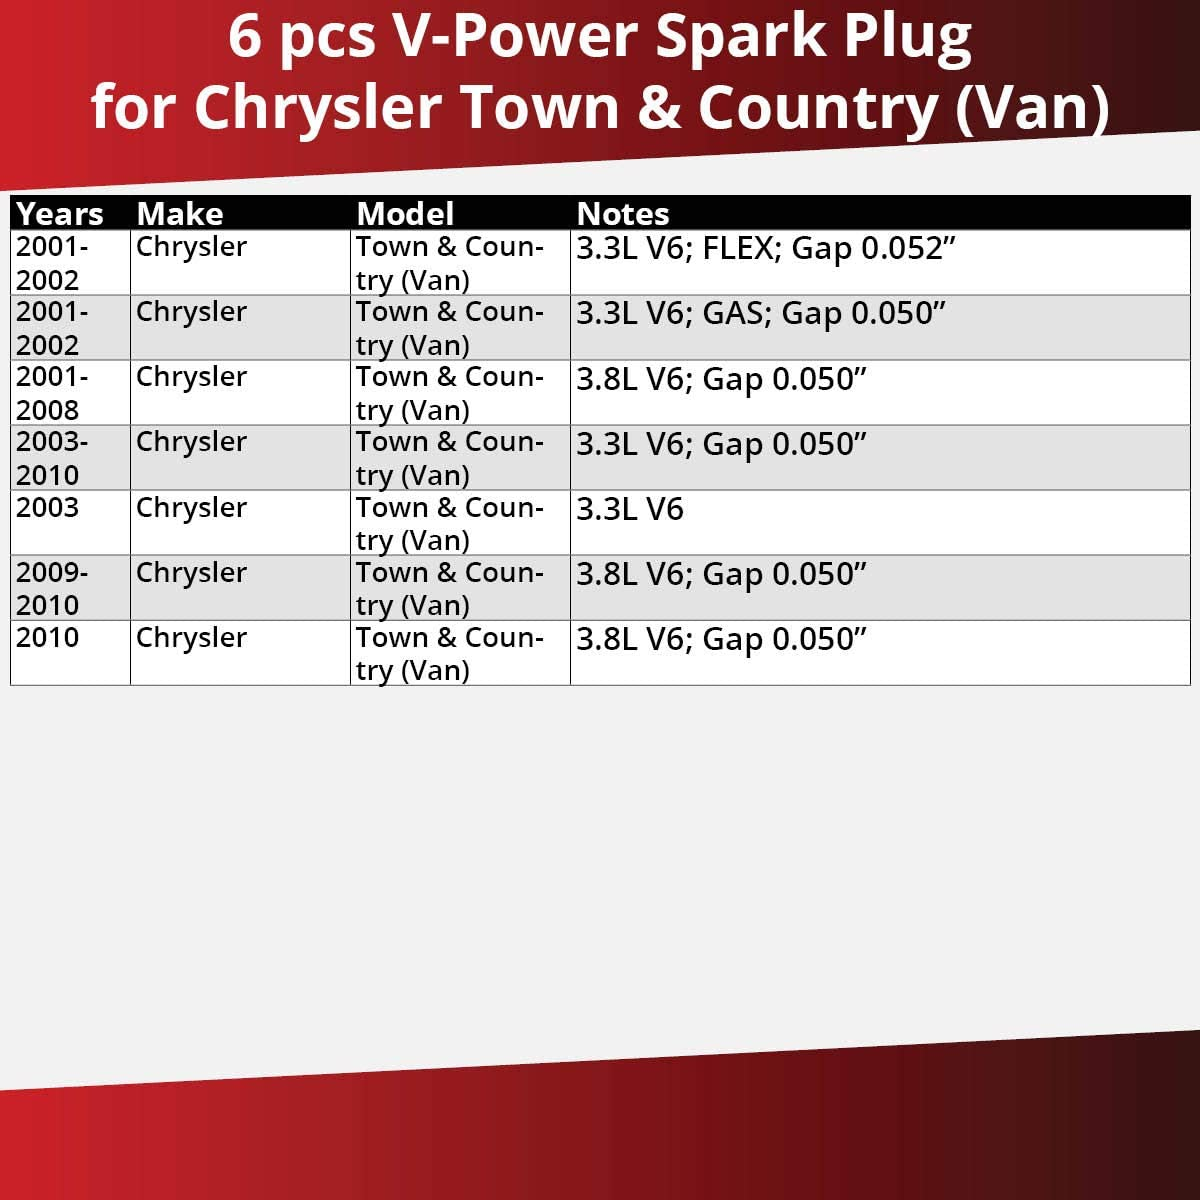 01-10 CHRYSLER TOWN /& COUNTRY NGK V-POWER SPARK PLUGS FREE NGK EMBLEM